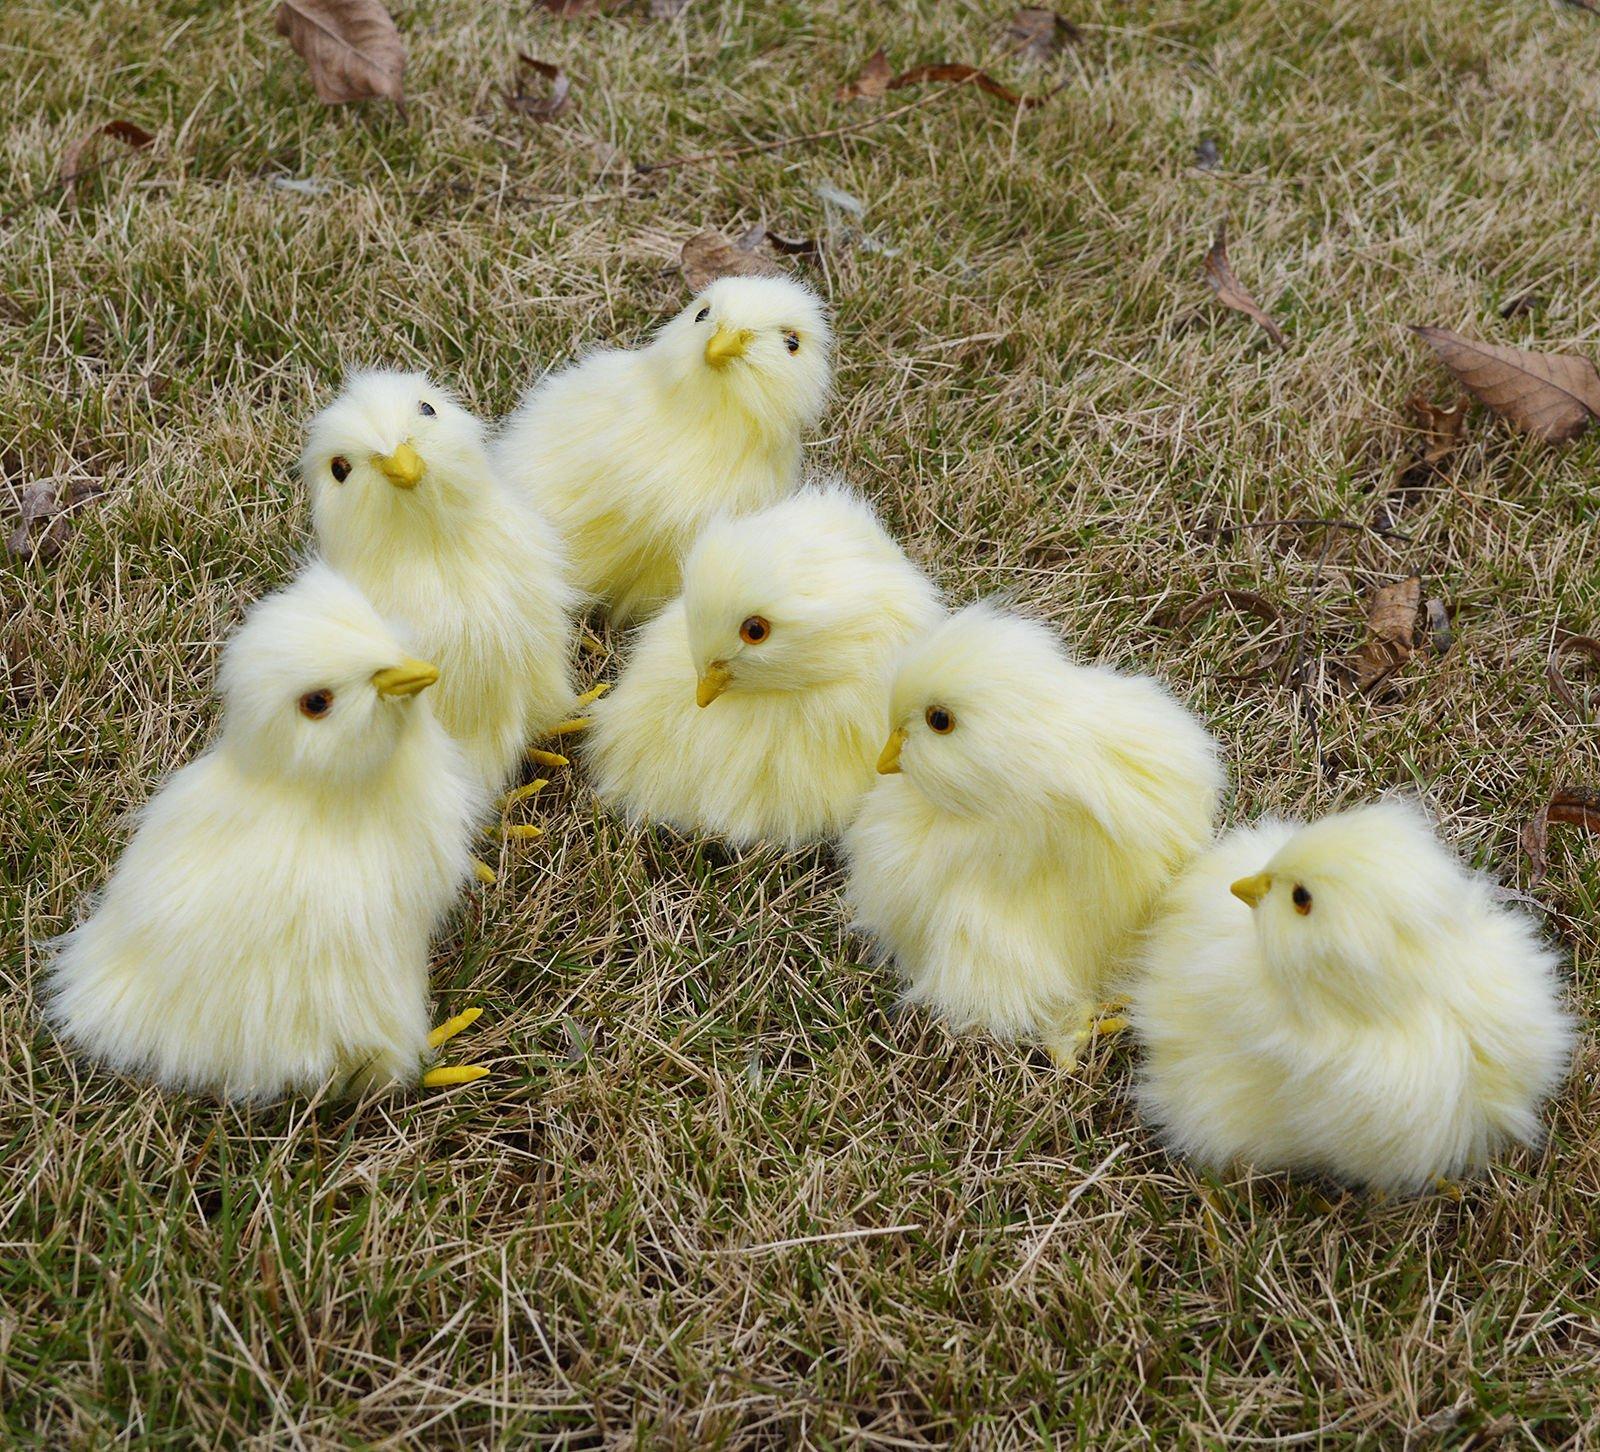 6 x Realistic Furry Baby Chicks Lifelike Plush Fur Animal Spring Easter Chicken Decoration